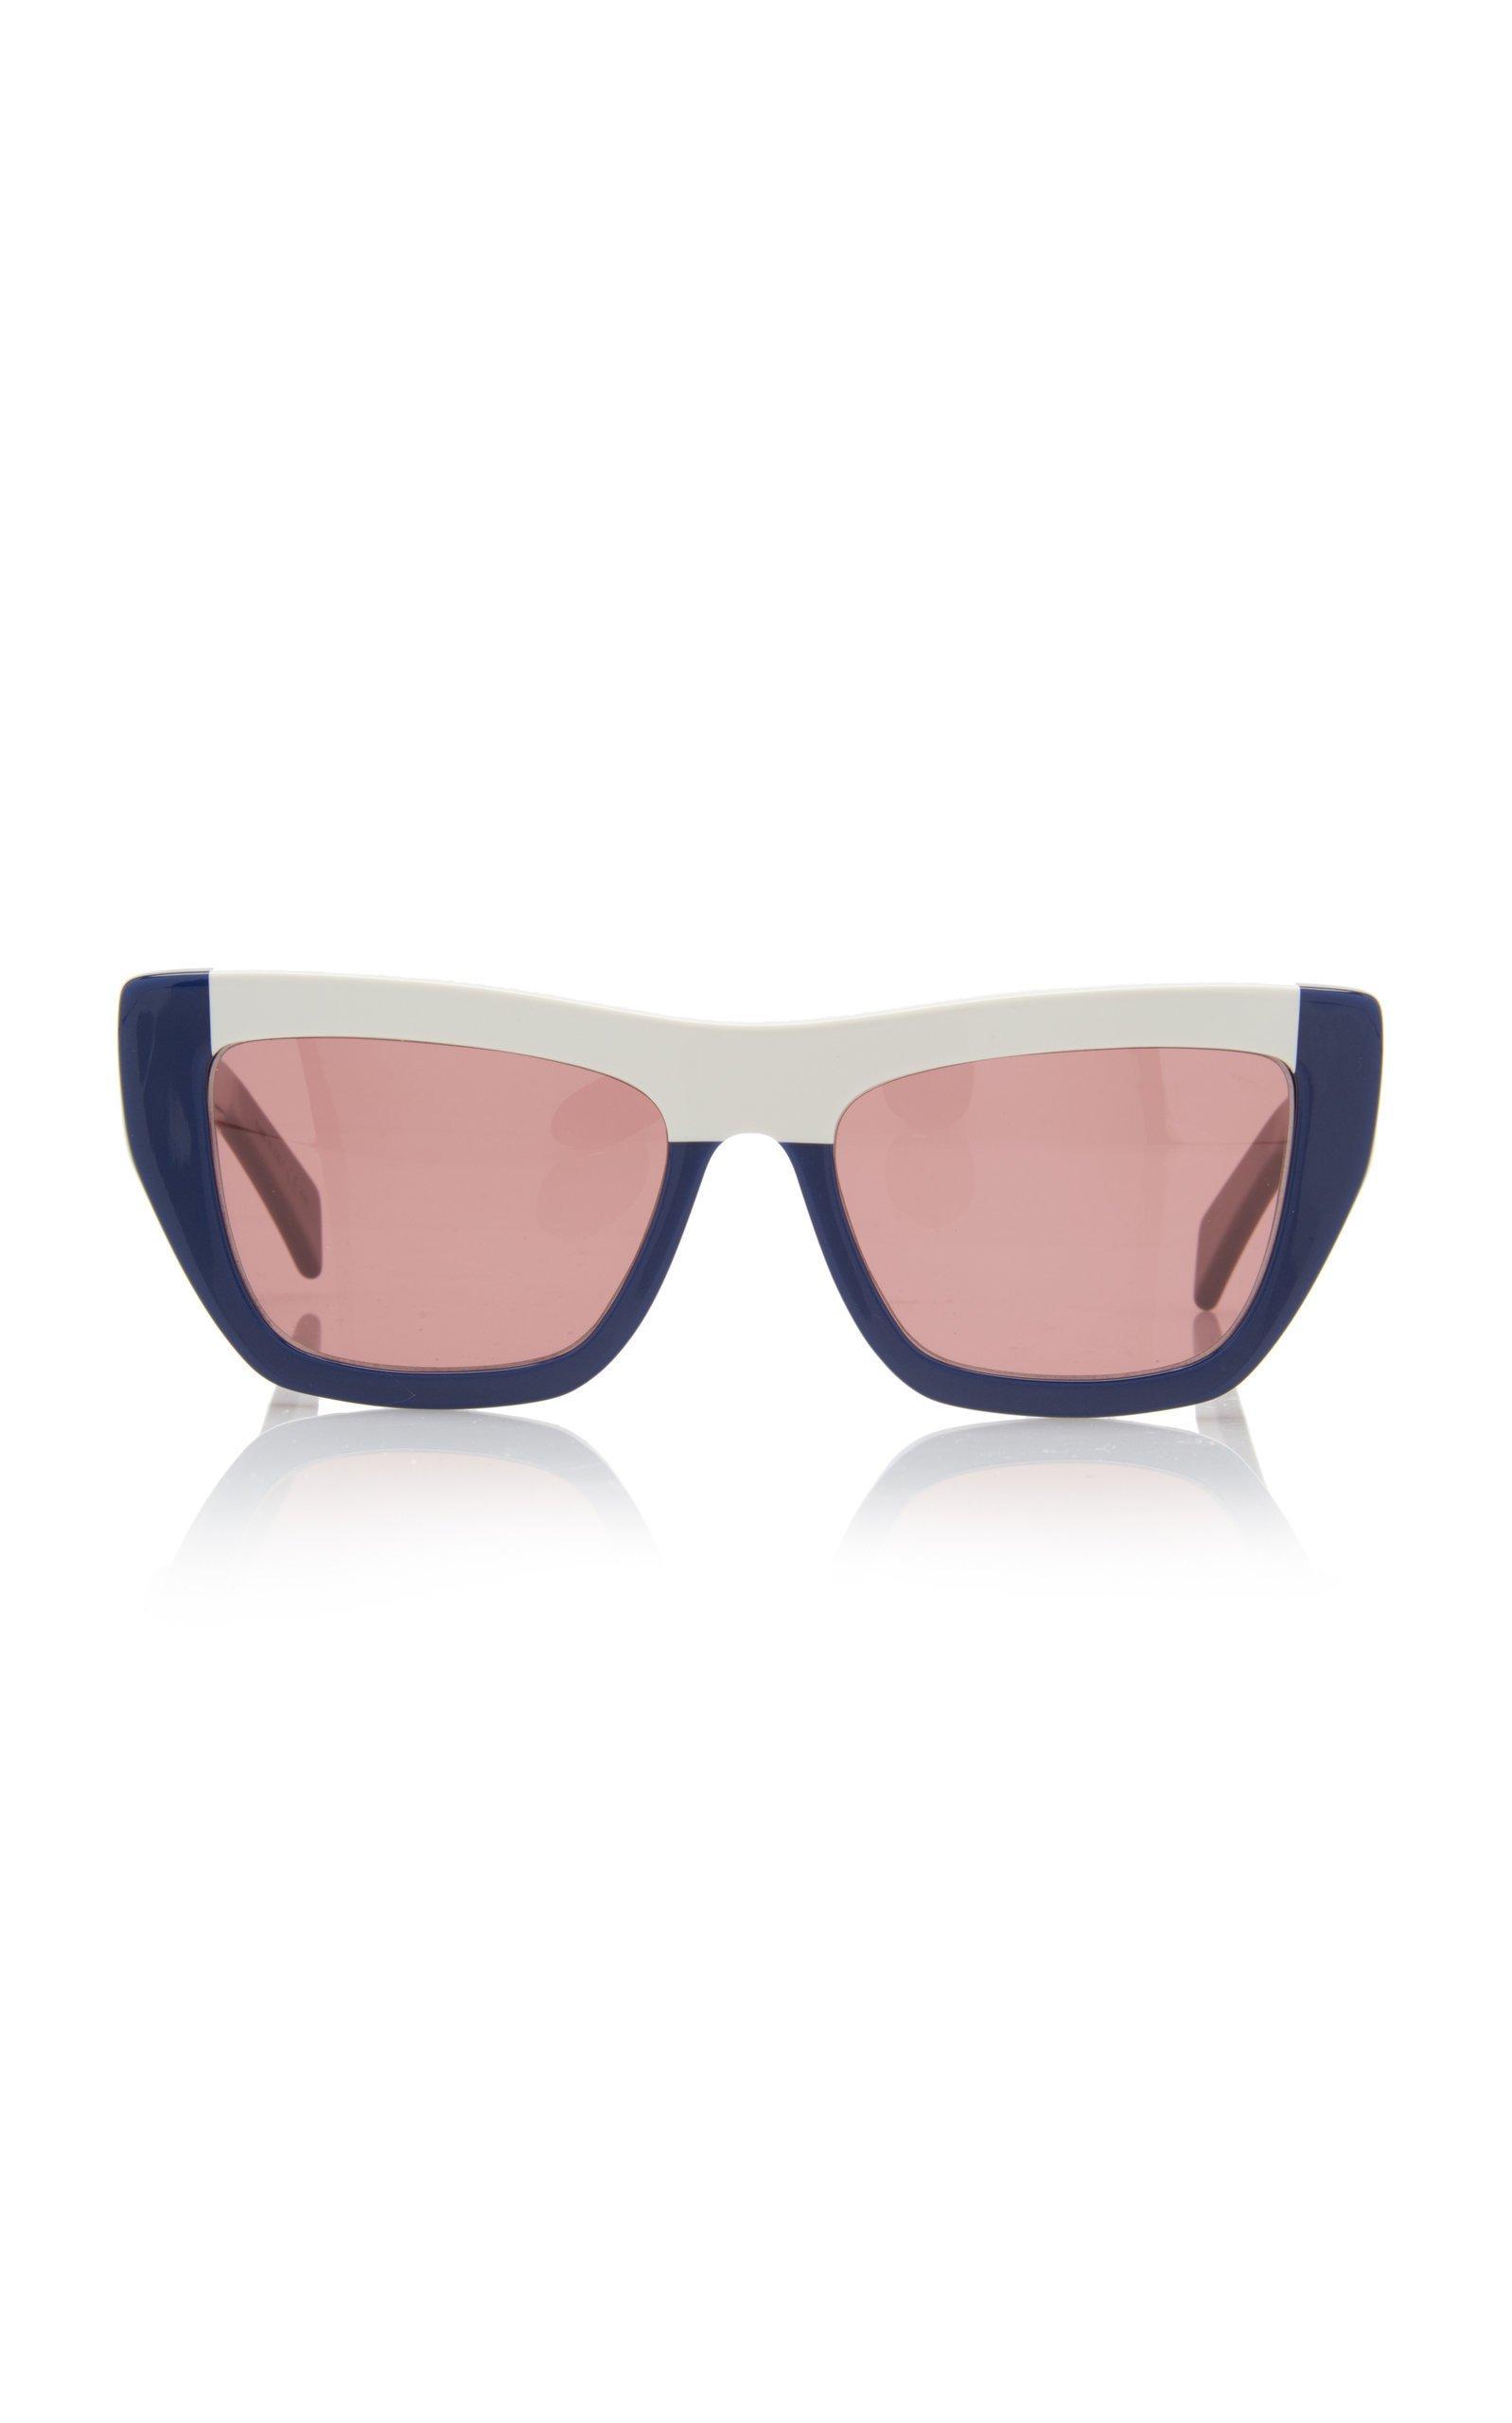 Marni Colorblocked Cat-Eye Sunglasses